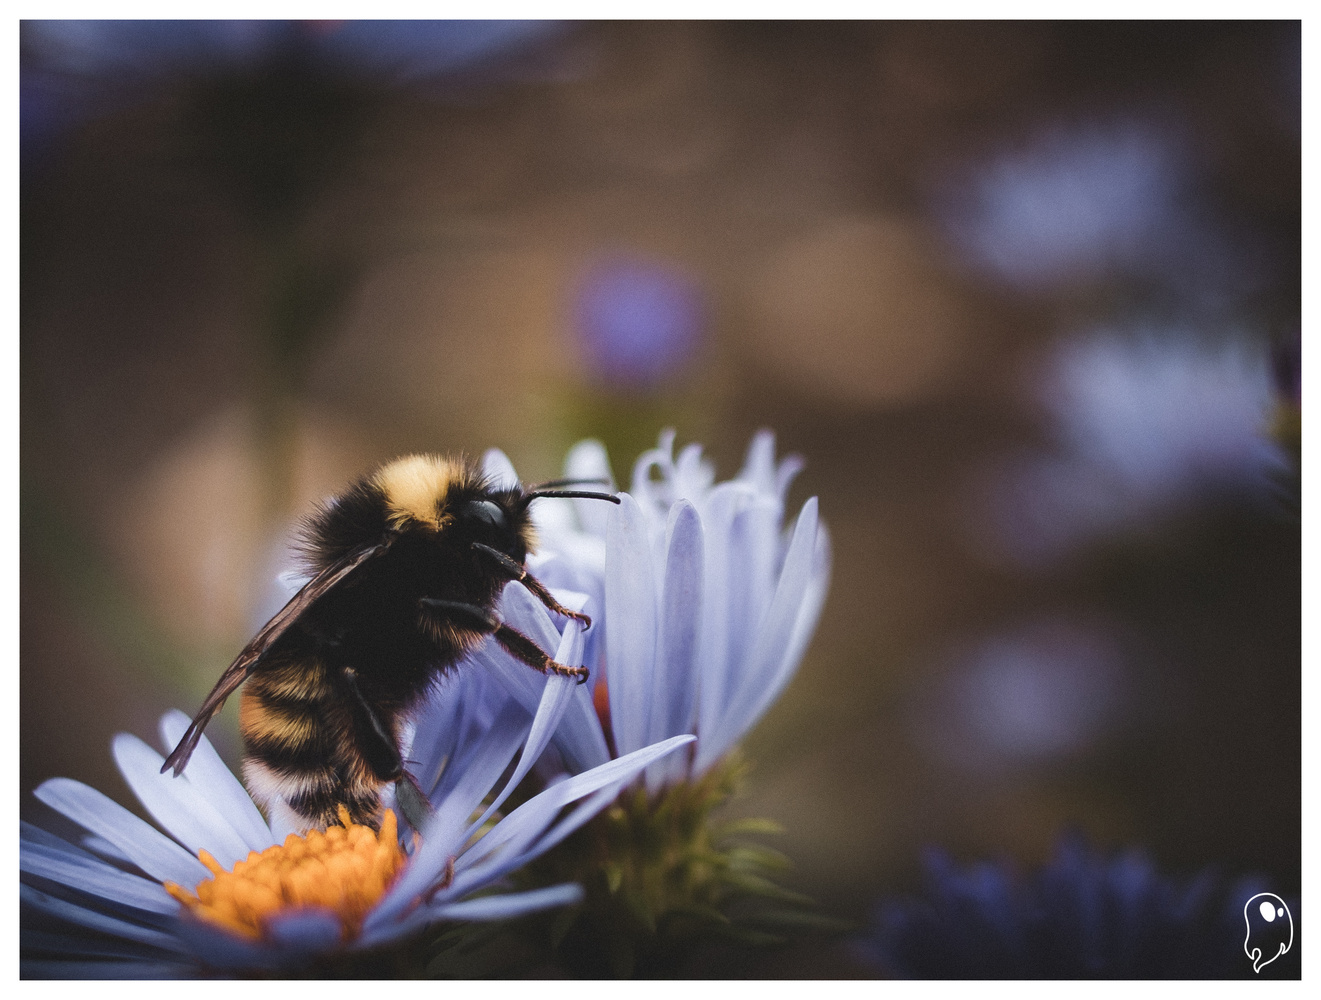 Buzzy Bee by Logan Johnson